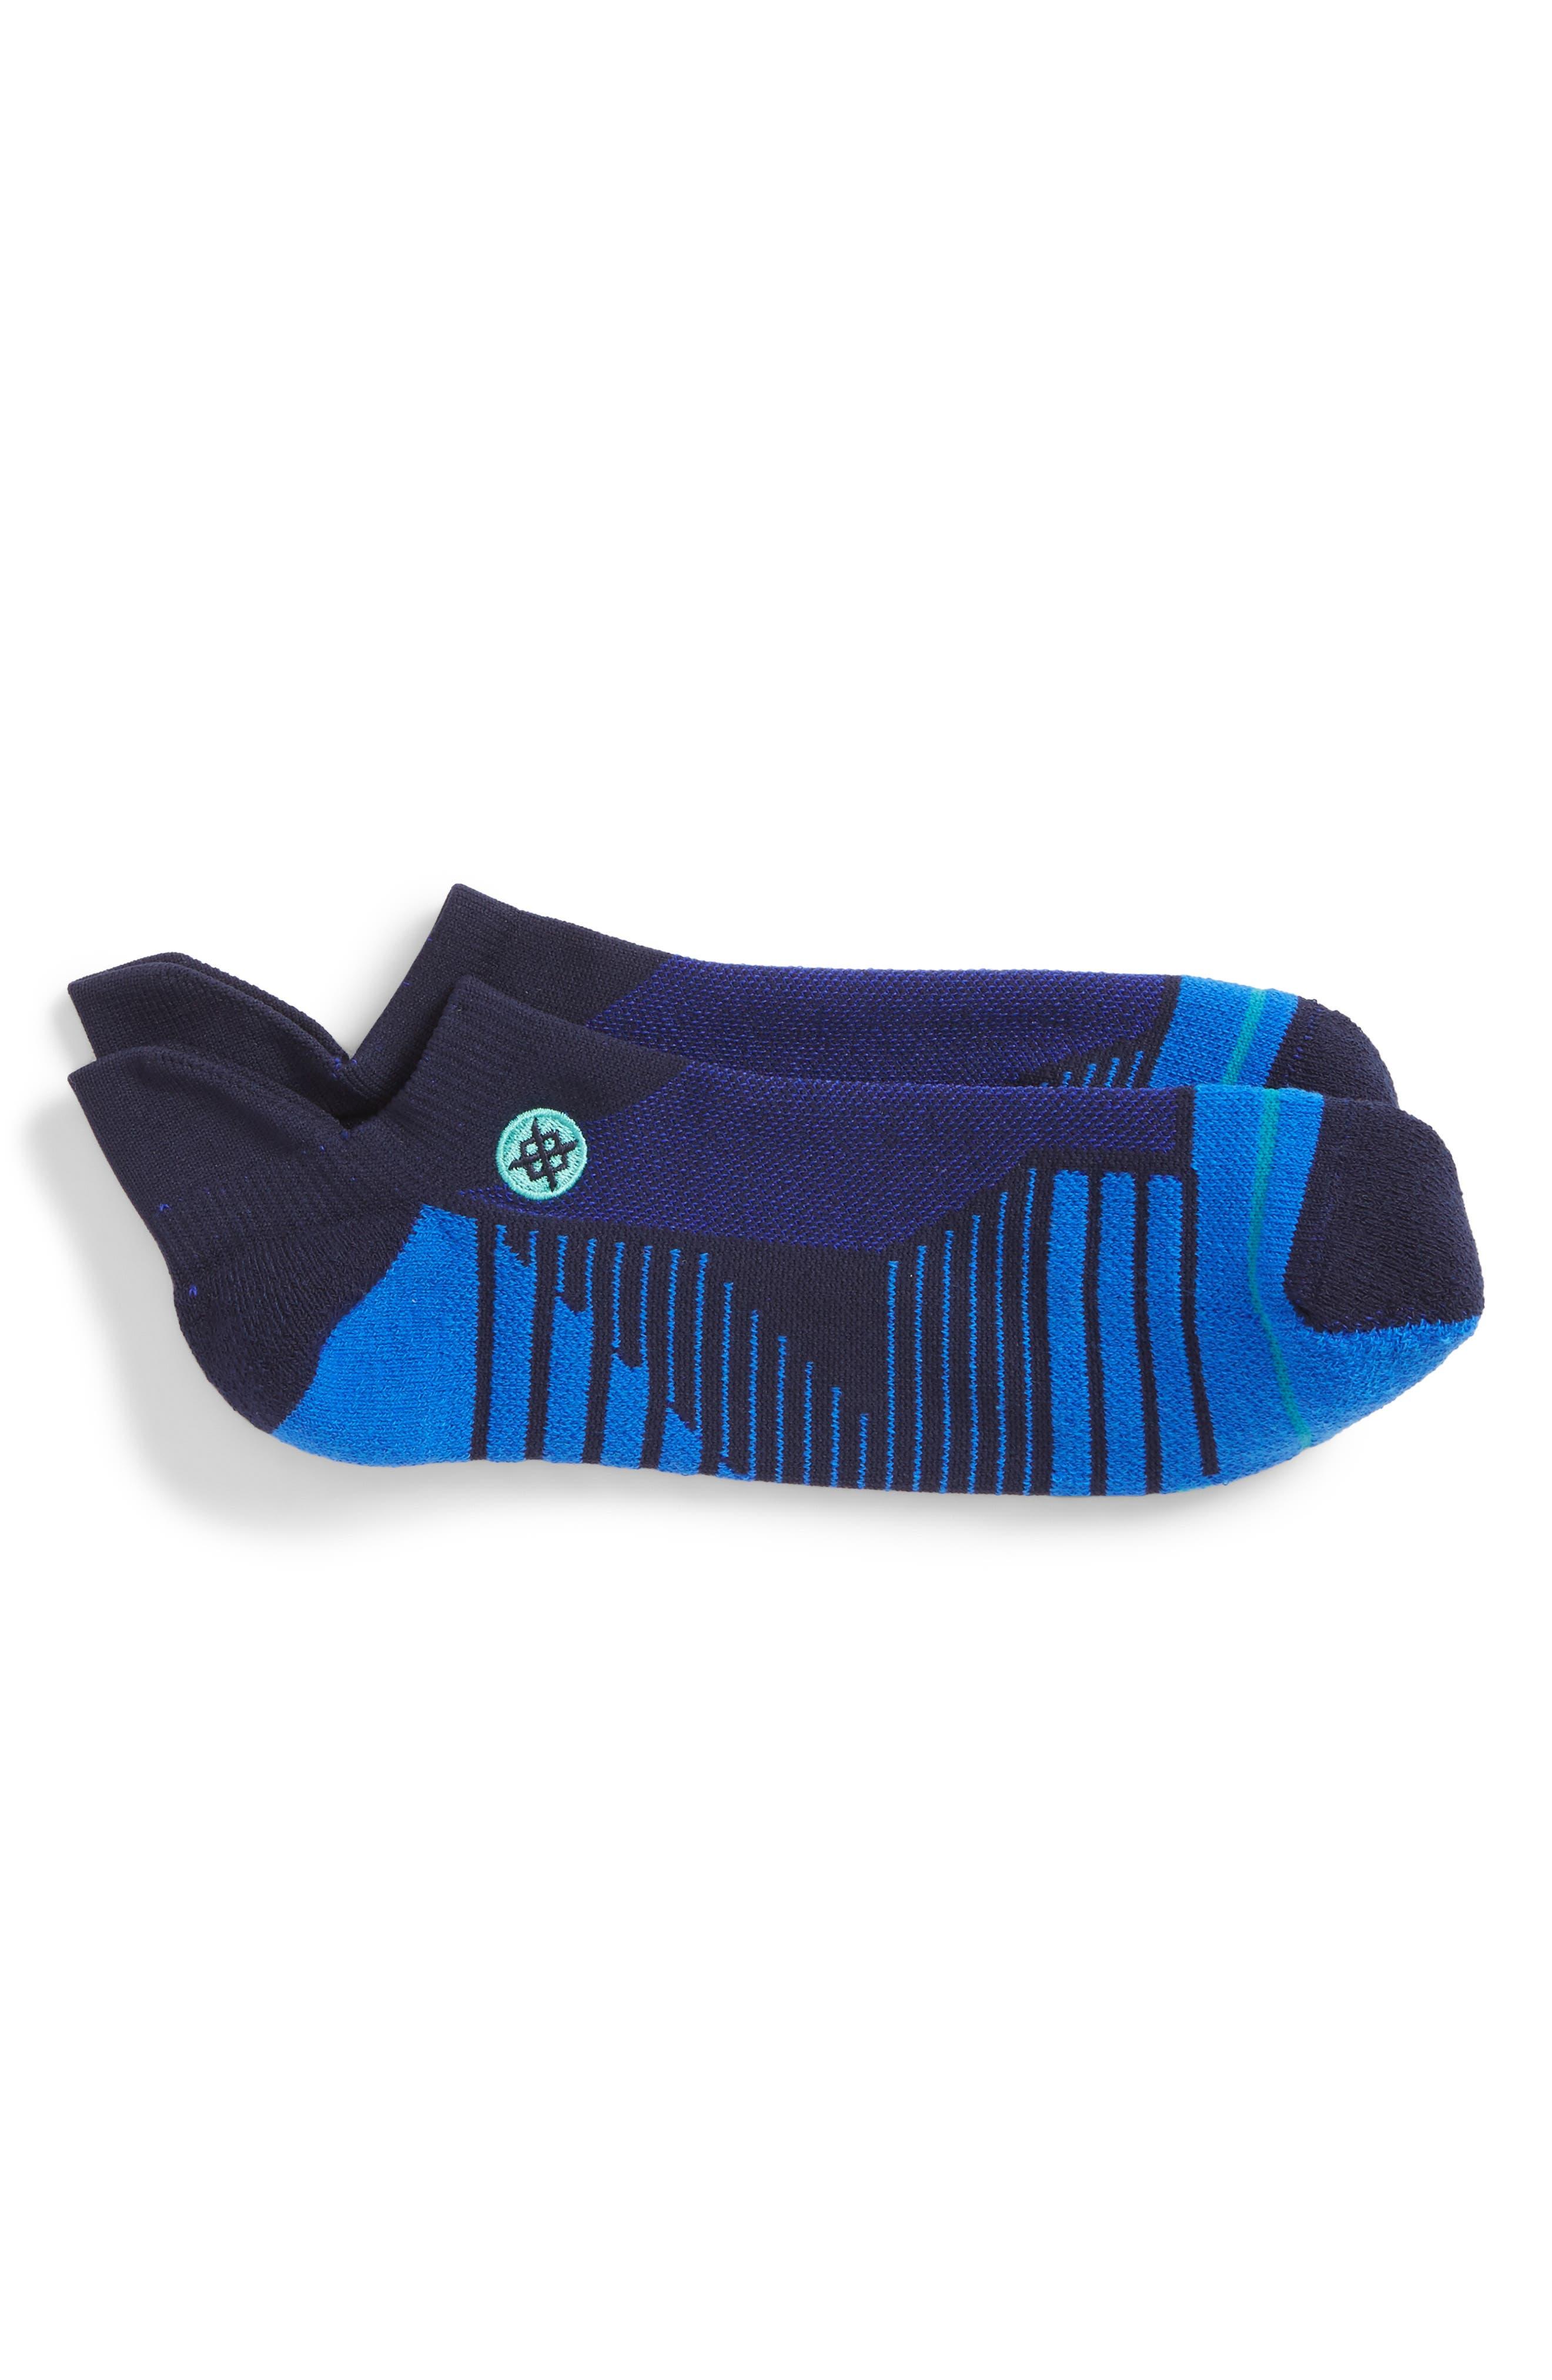 High Regard Tab Socks,                         Main,                         color, Navy